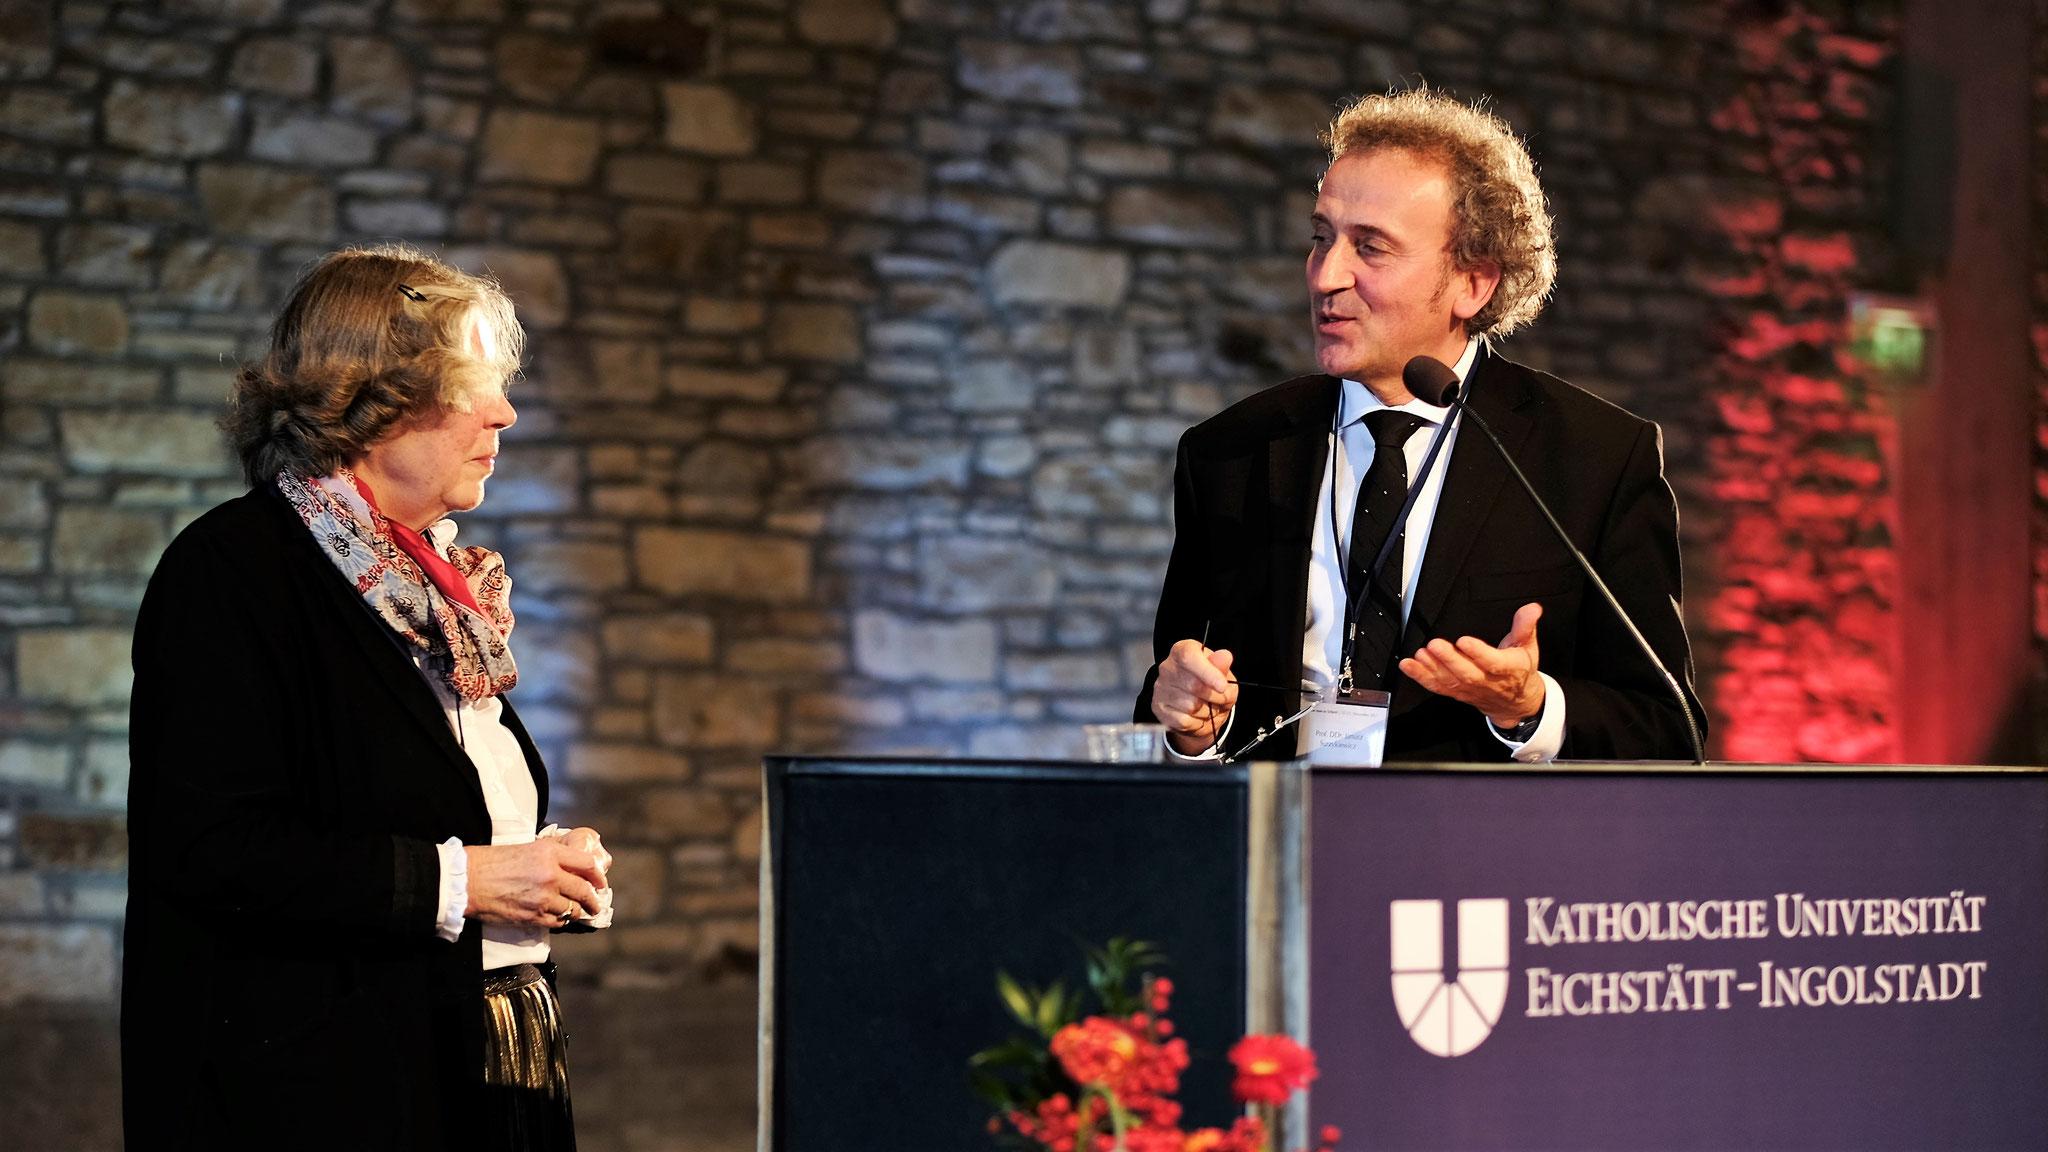 Prof. Dr. Hanna-Barbara Gerl-Falkovitz, Prof. DDr. Janusz Surzykiewicz